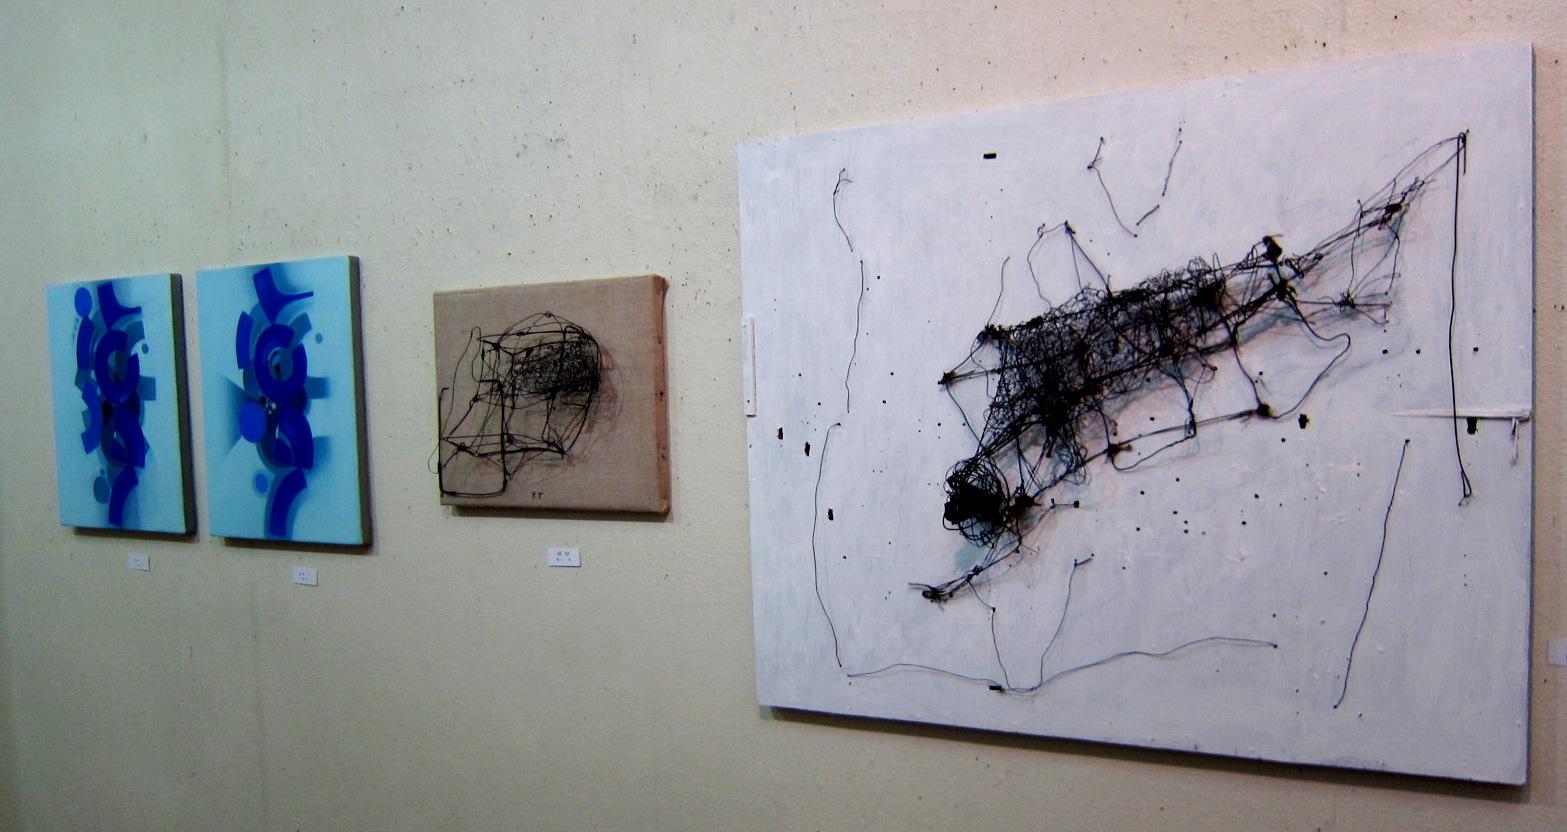 2354) 「LA`TAPIO -Ⅱ- Exhibition」 たぴお 1月27日(月)~2月15日(土)_f0126829_1016286.jpg